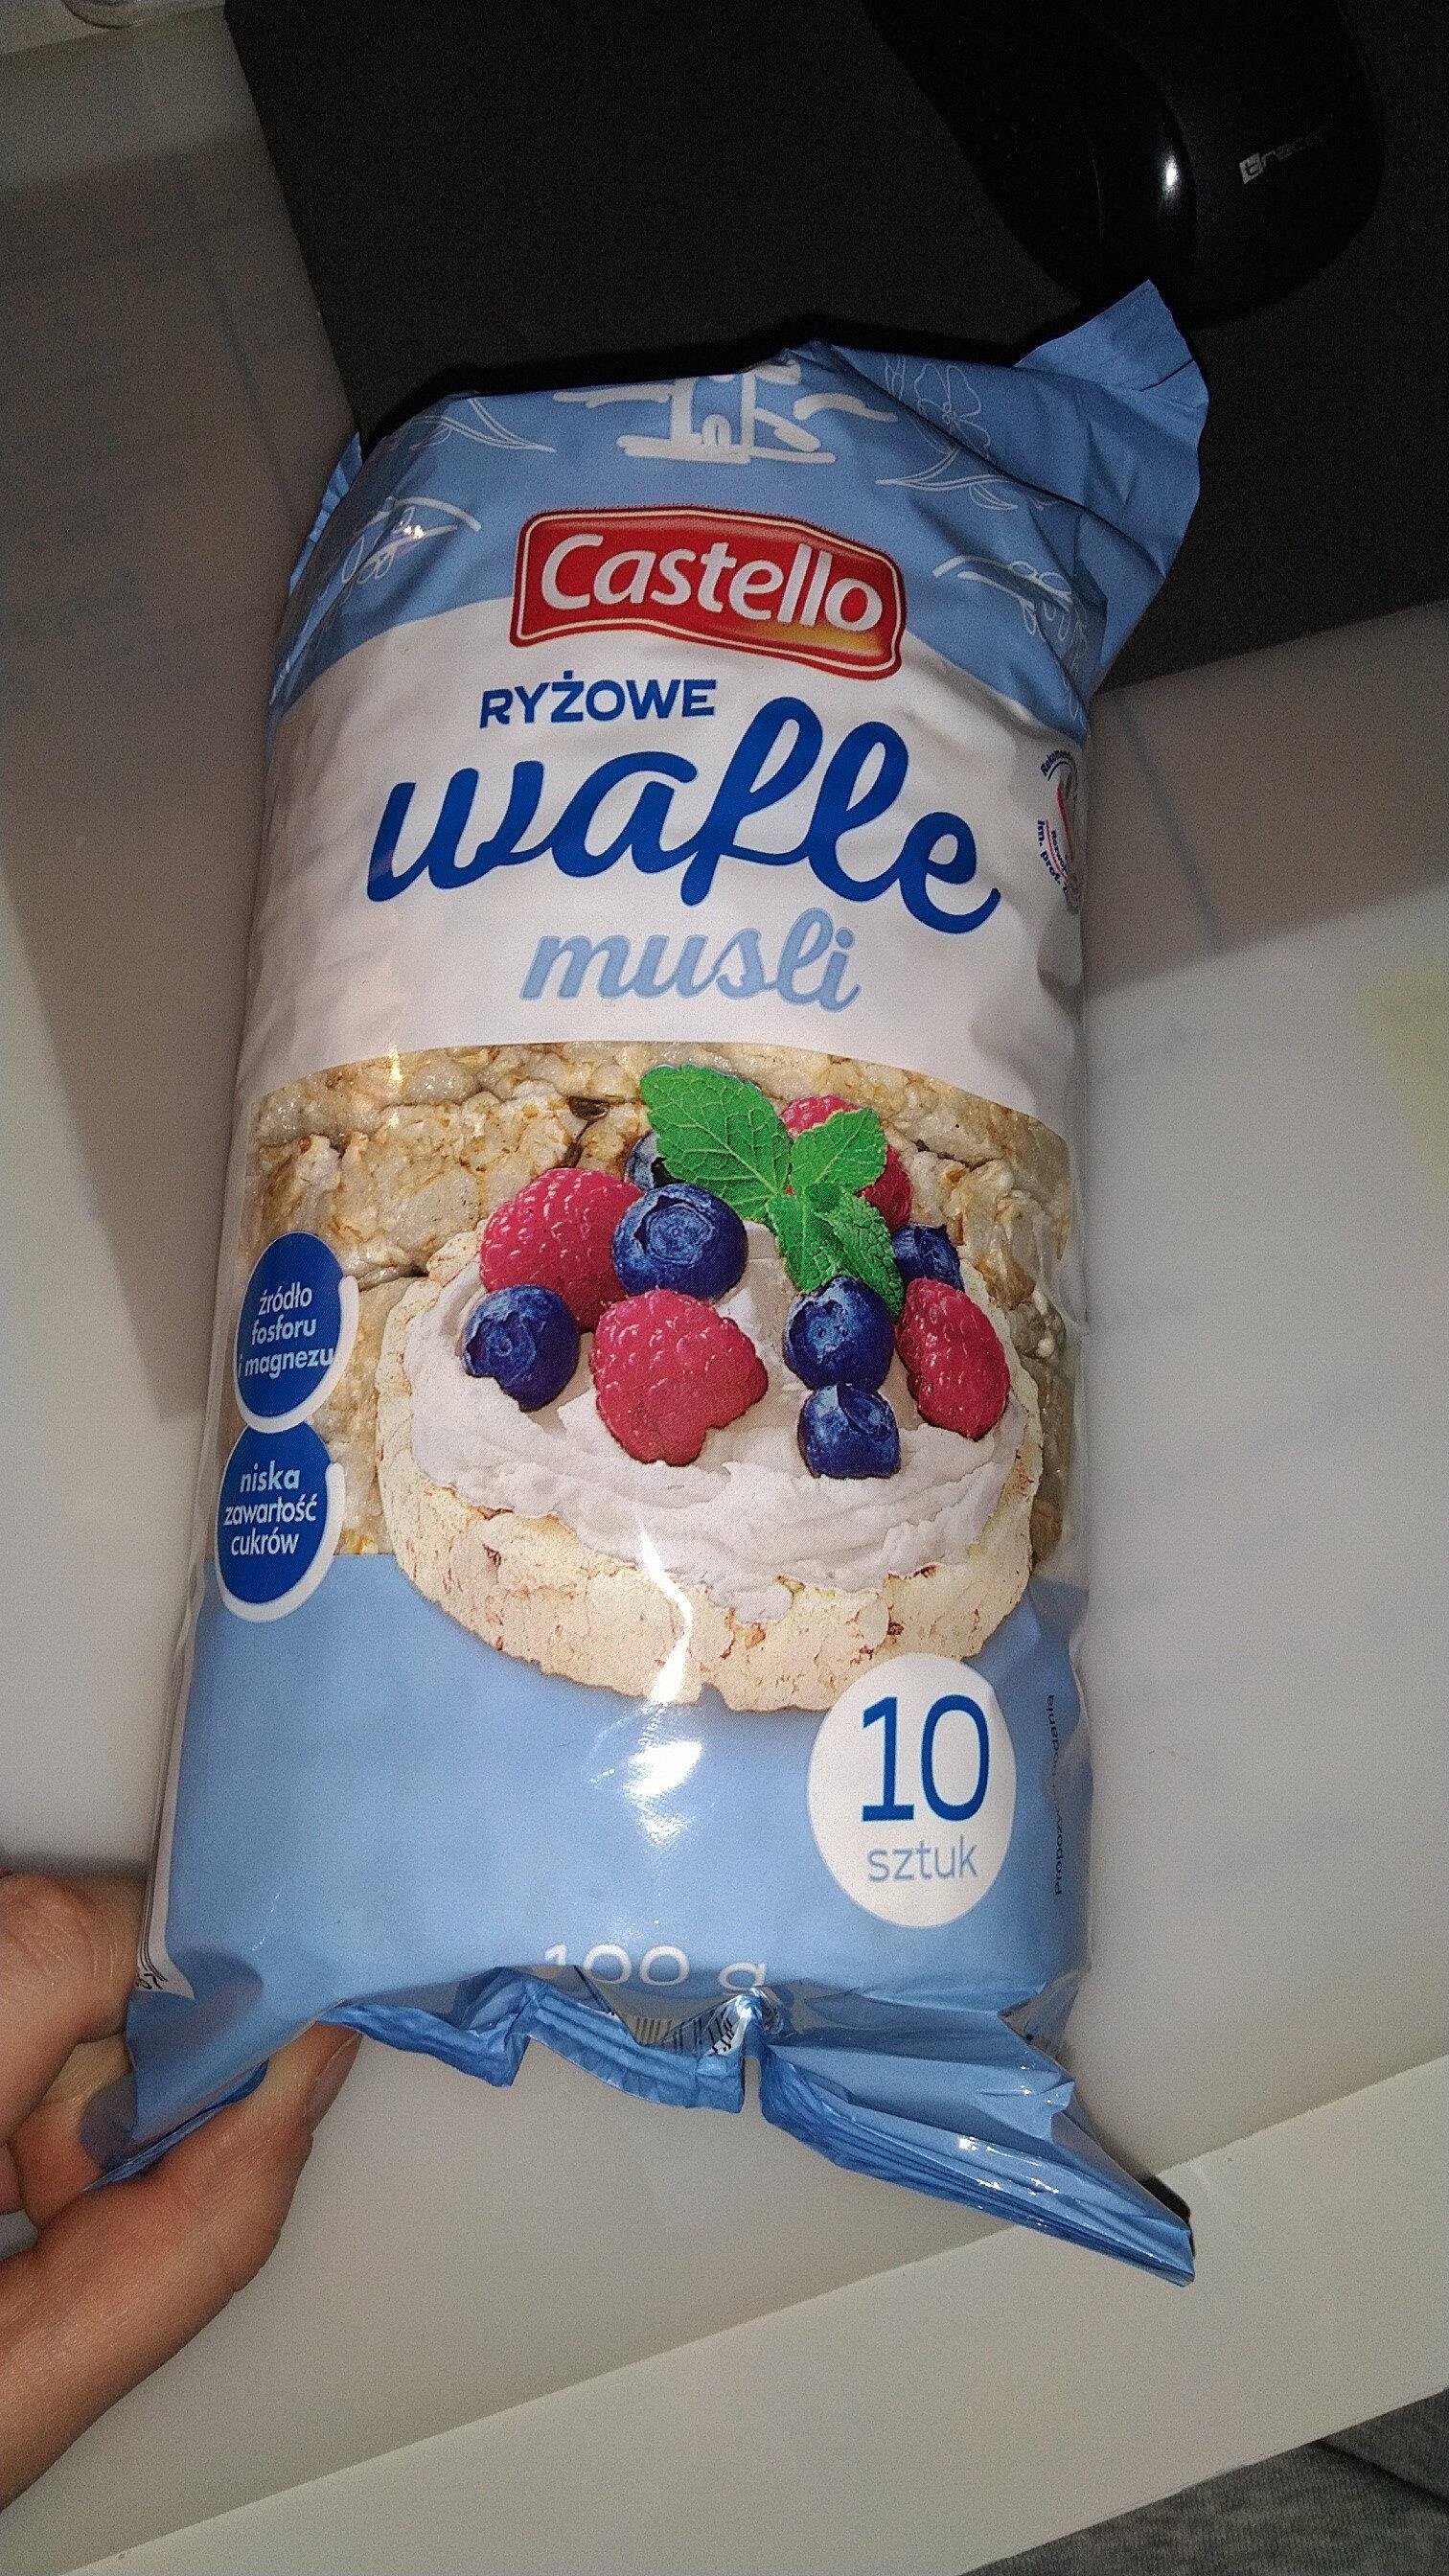 Wafle ryżowe musli - Produkt - pl